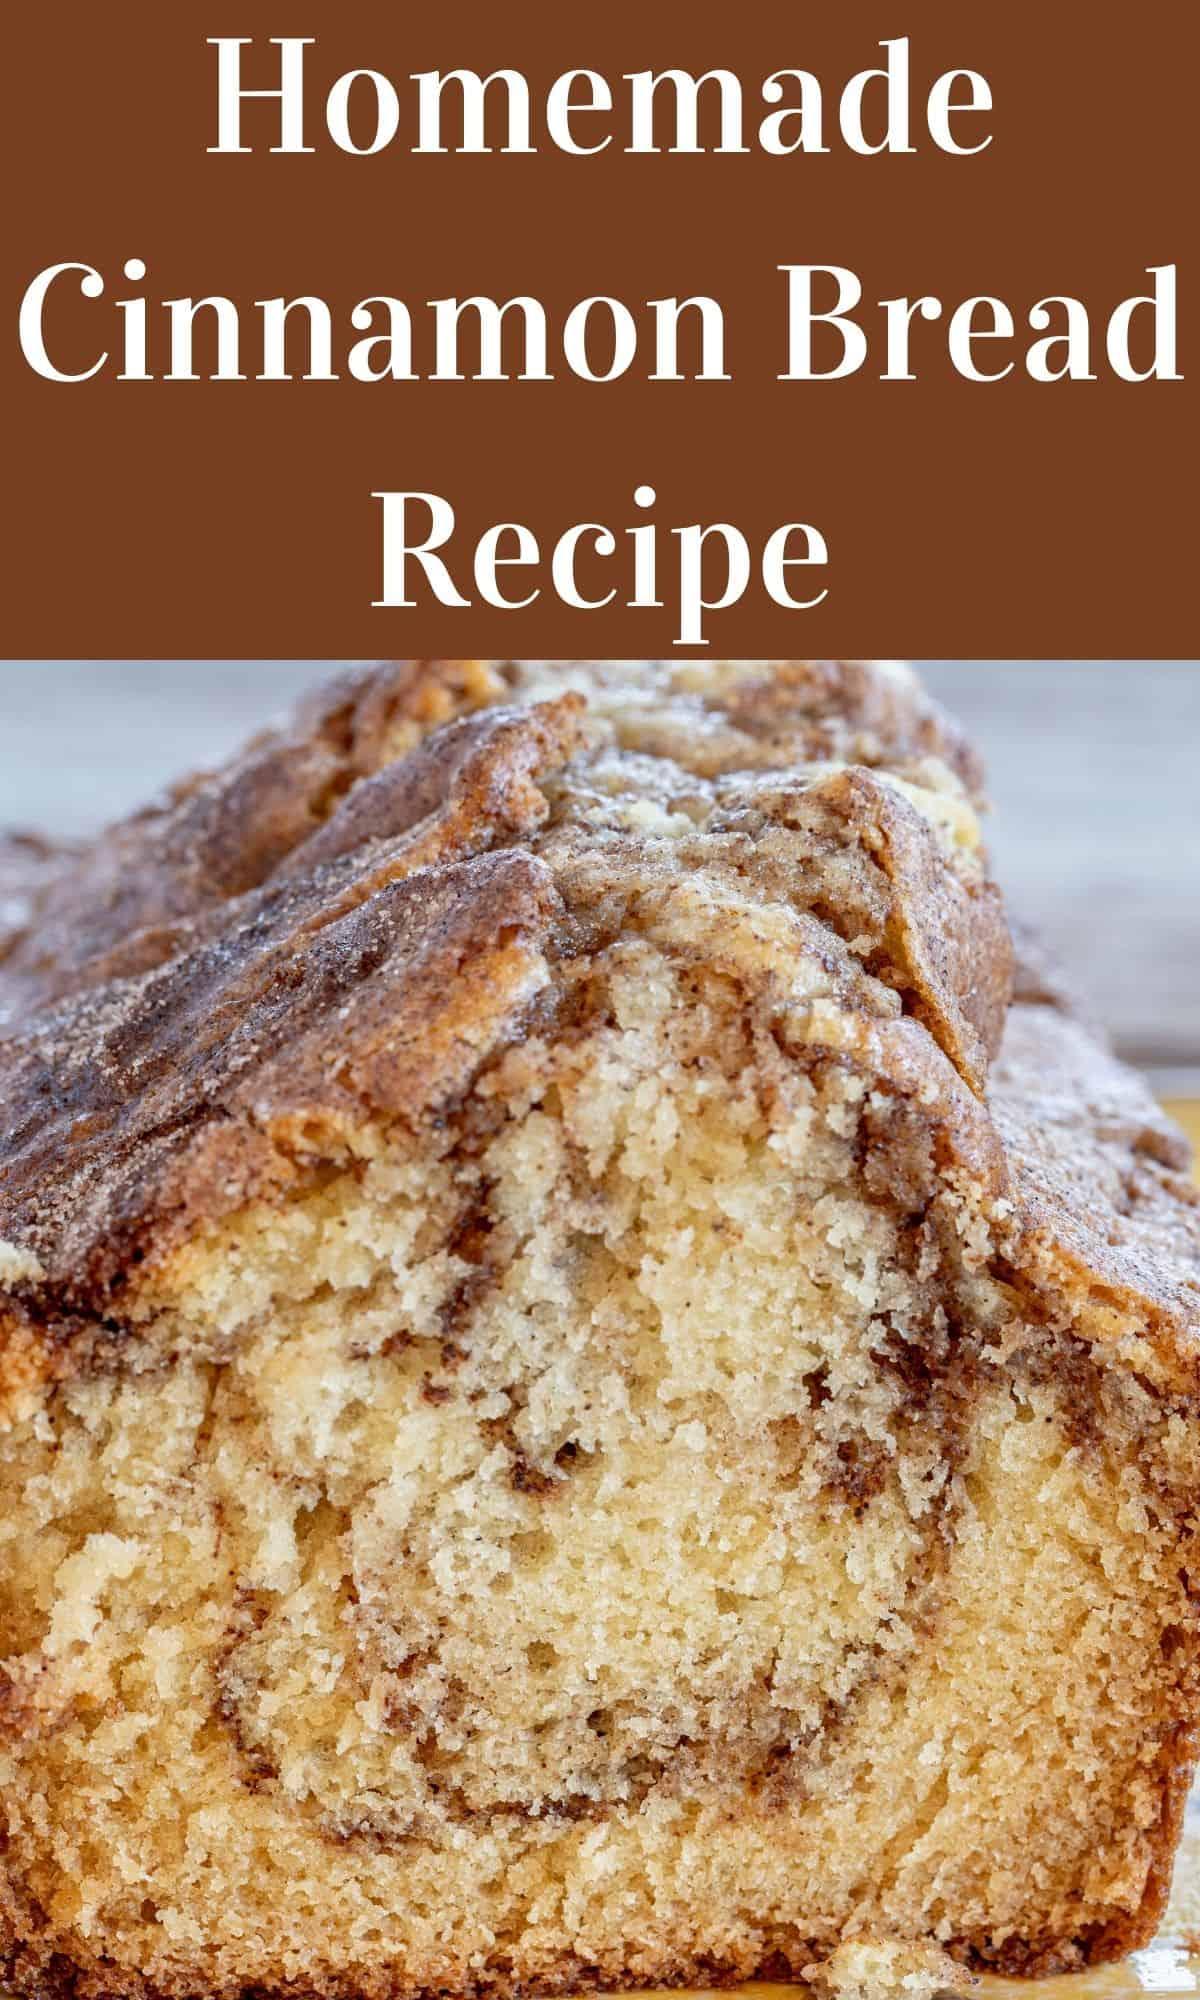 homemade cinnamon bread for PIN